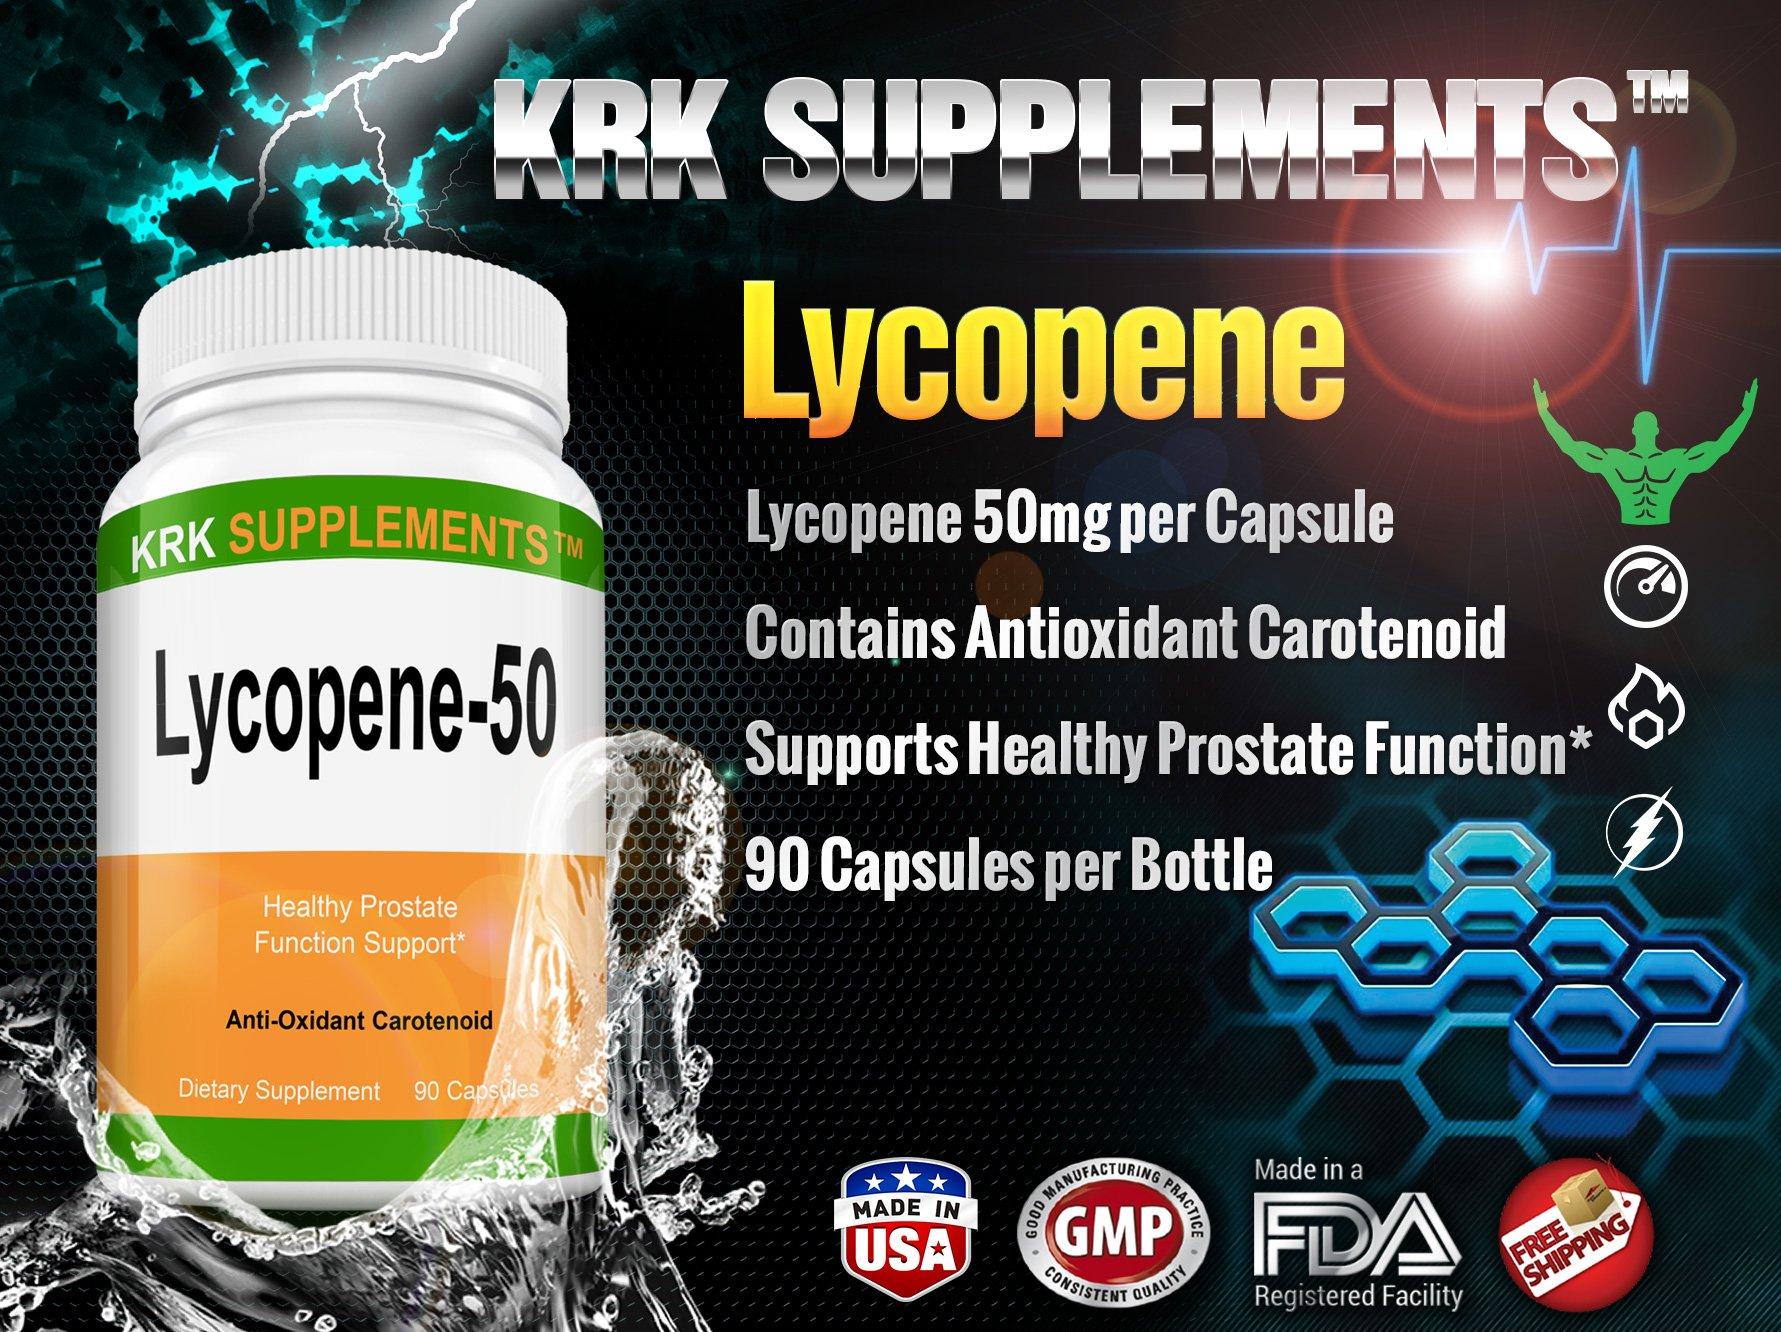 2 Bottles Lycopene 50mg 180 Total Capsules KRK Supplements by KRK SUPPLEMENTS (Image #3)